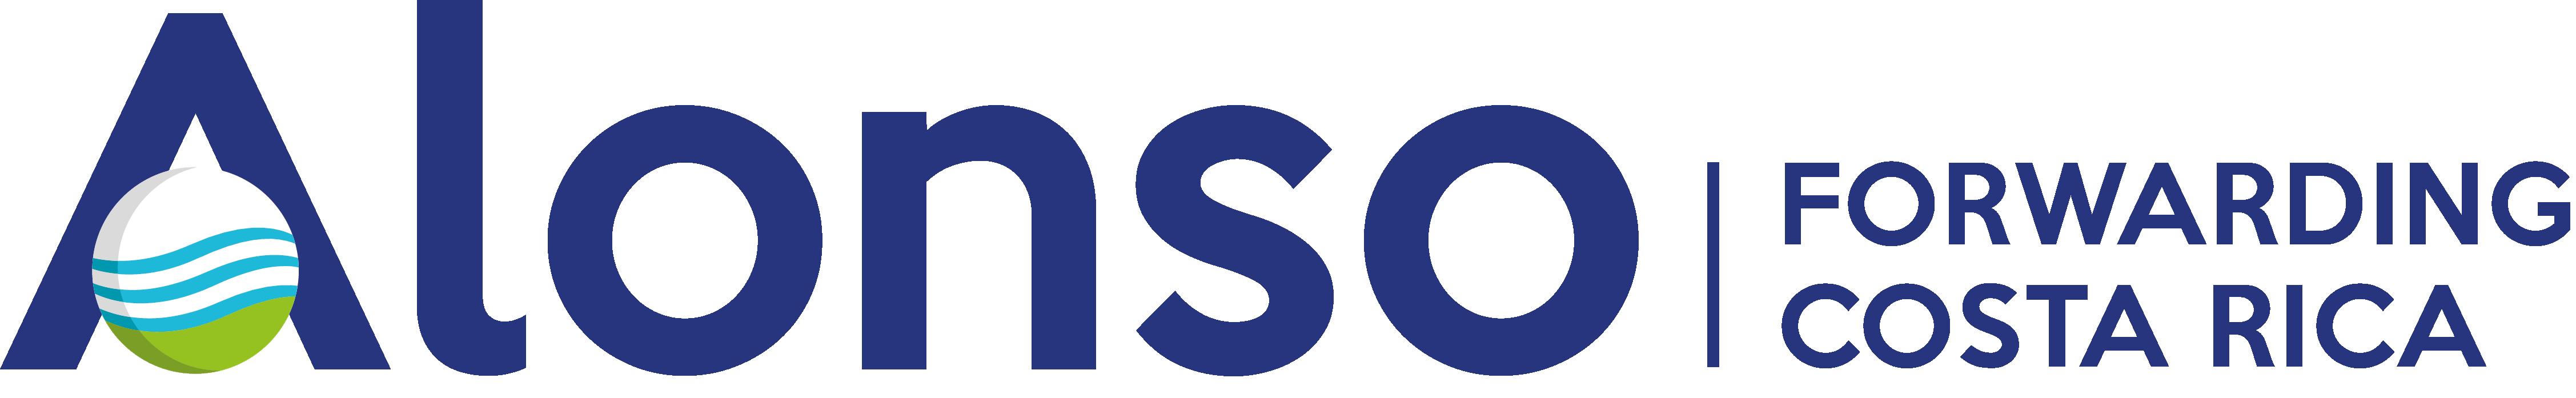 Logotipo Alonso Forwarding Costa Rica.